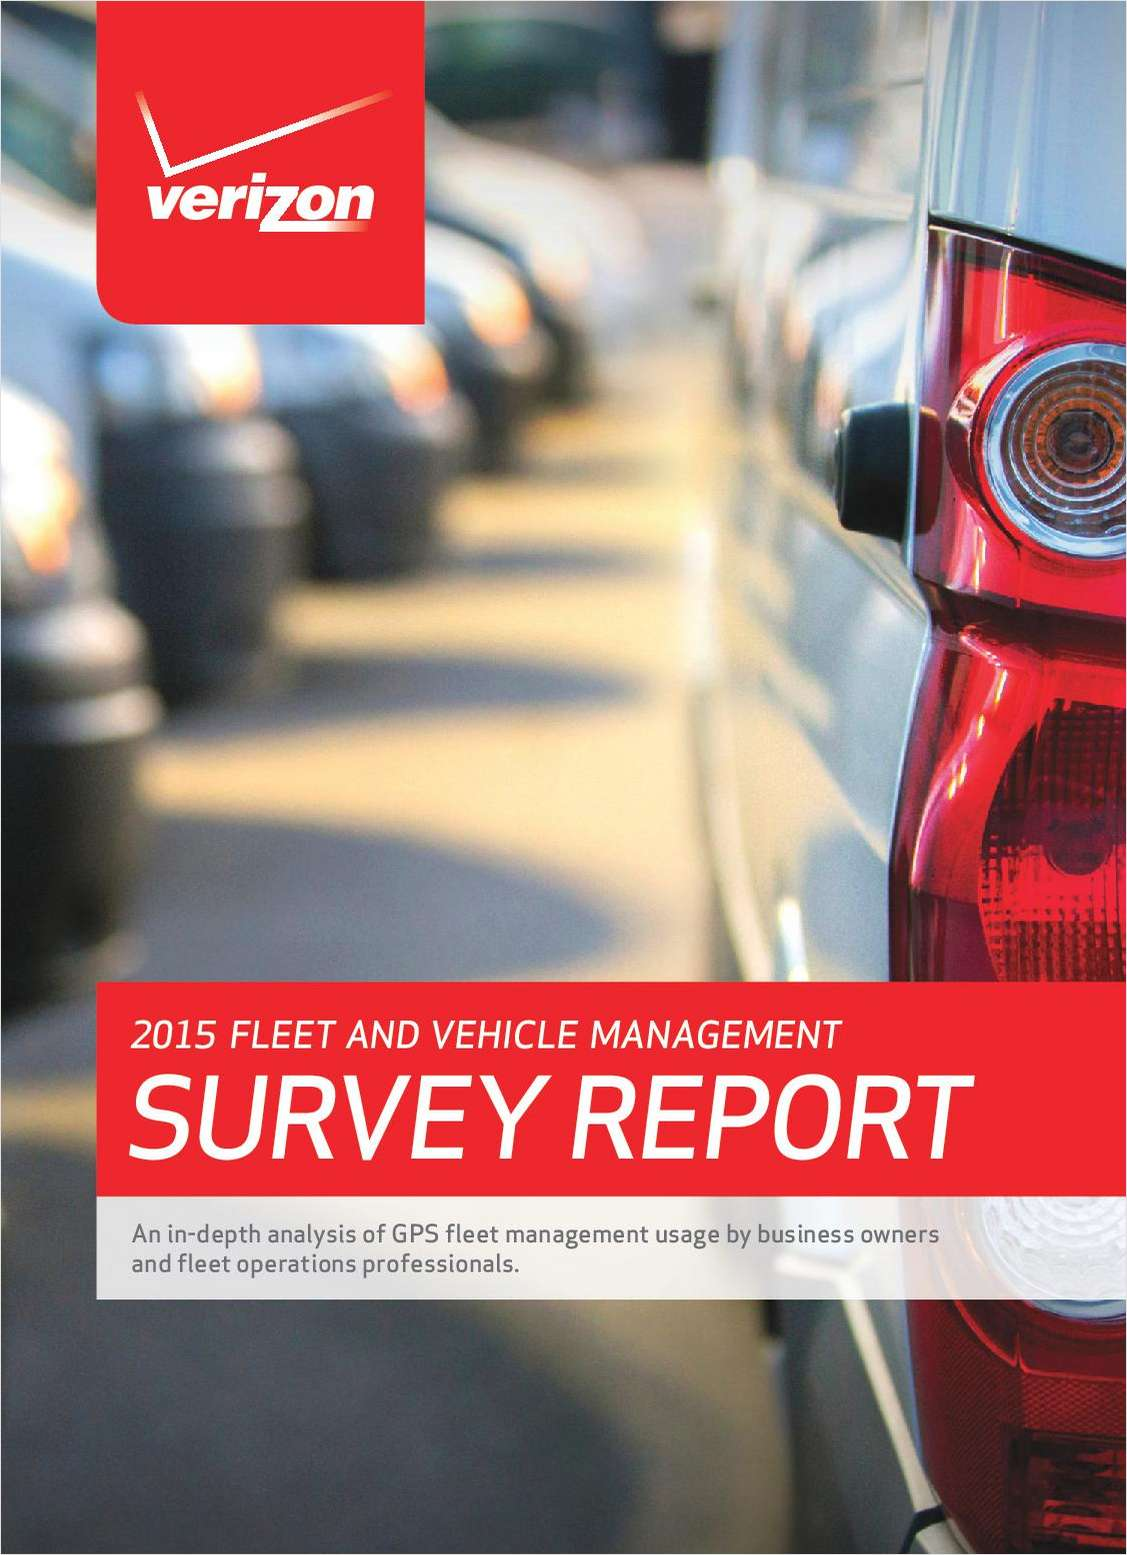 2015 Fleet and Vehicle Management Survey Report